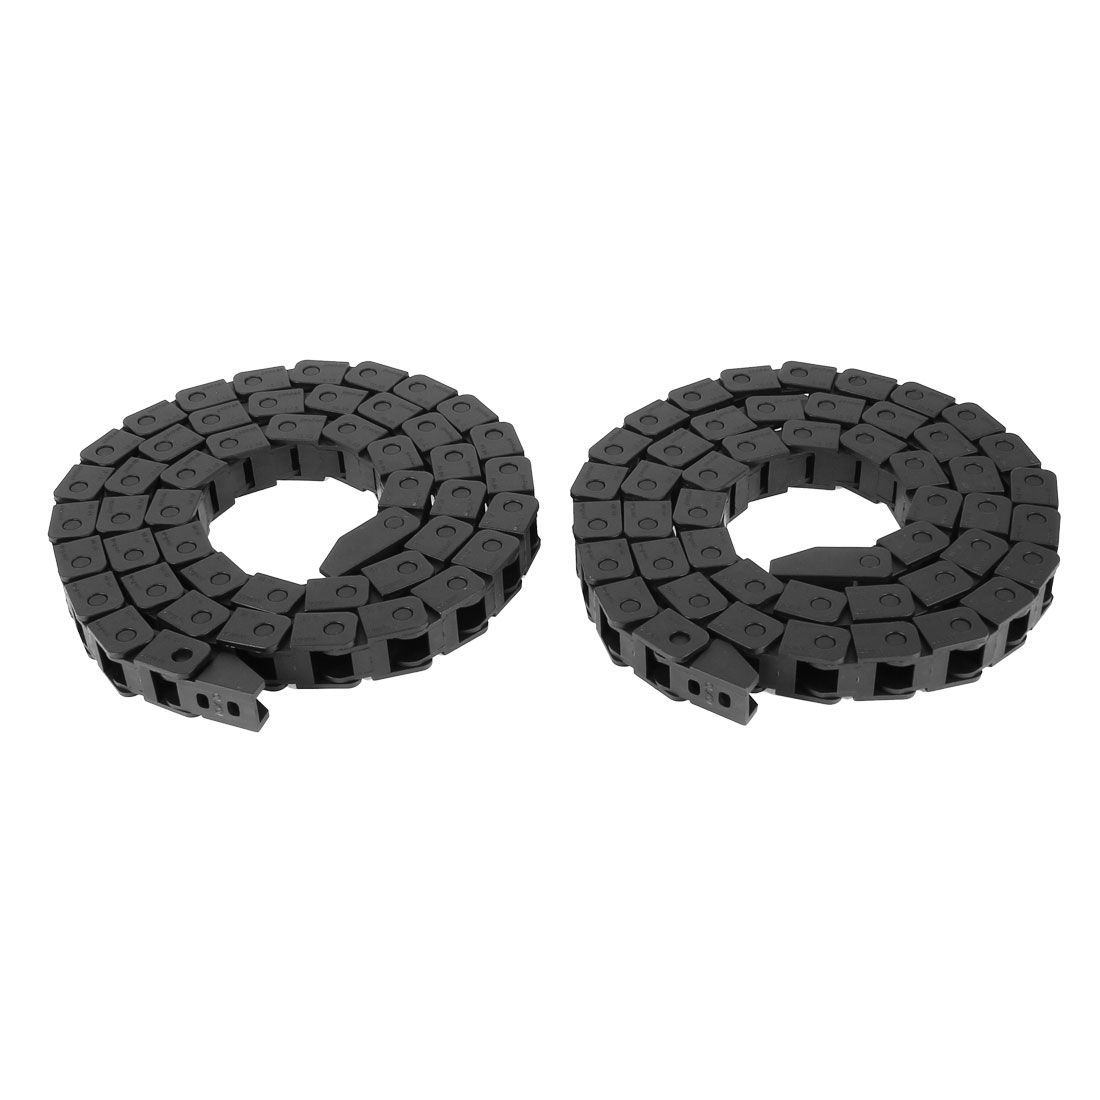 2 Pcs 10mm x 10mm Black Flexible Semi Enclosed Cable Drag Chain 105cm